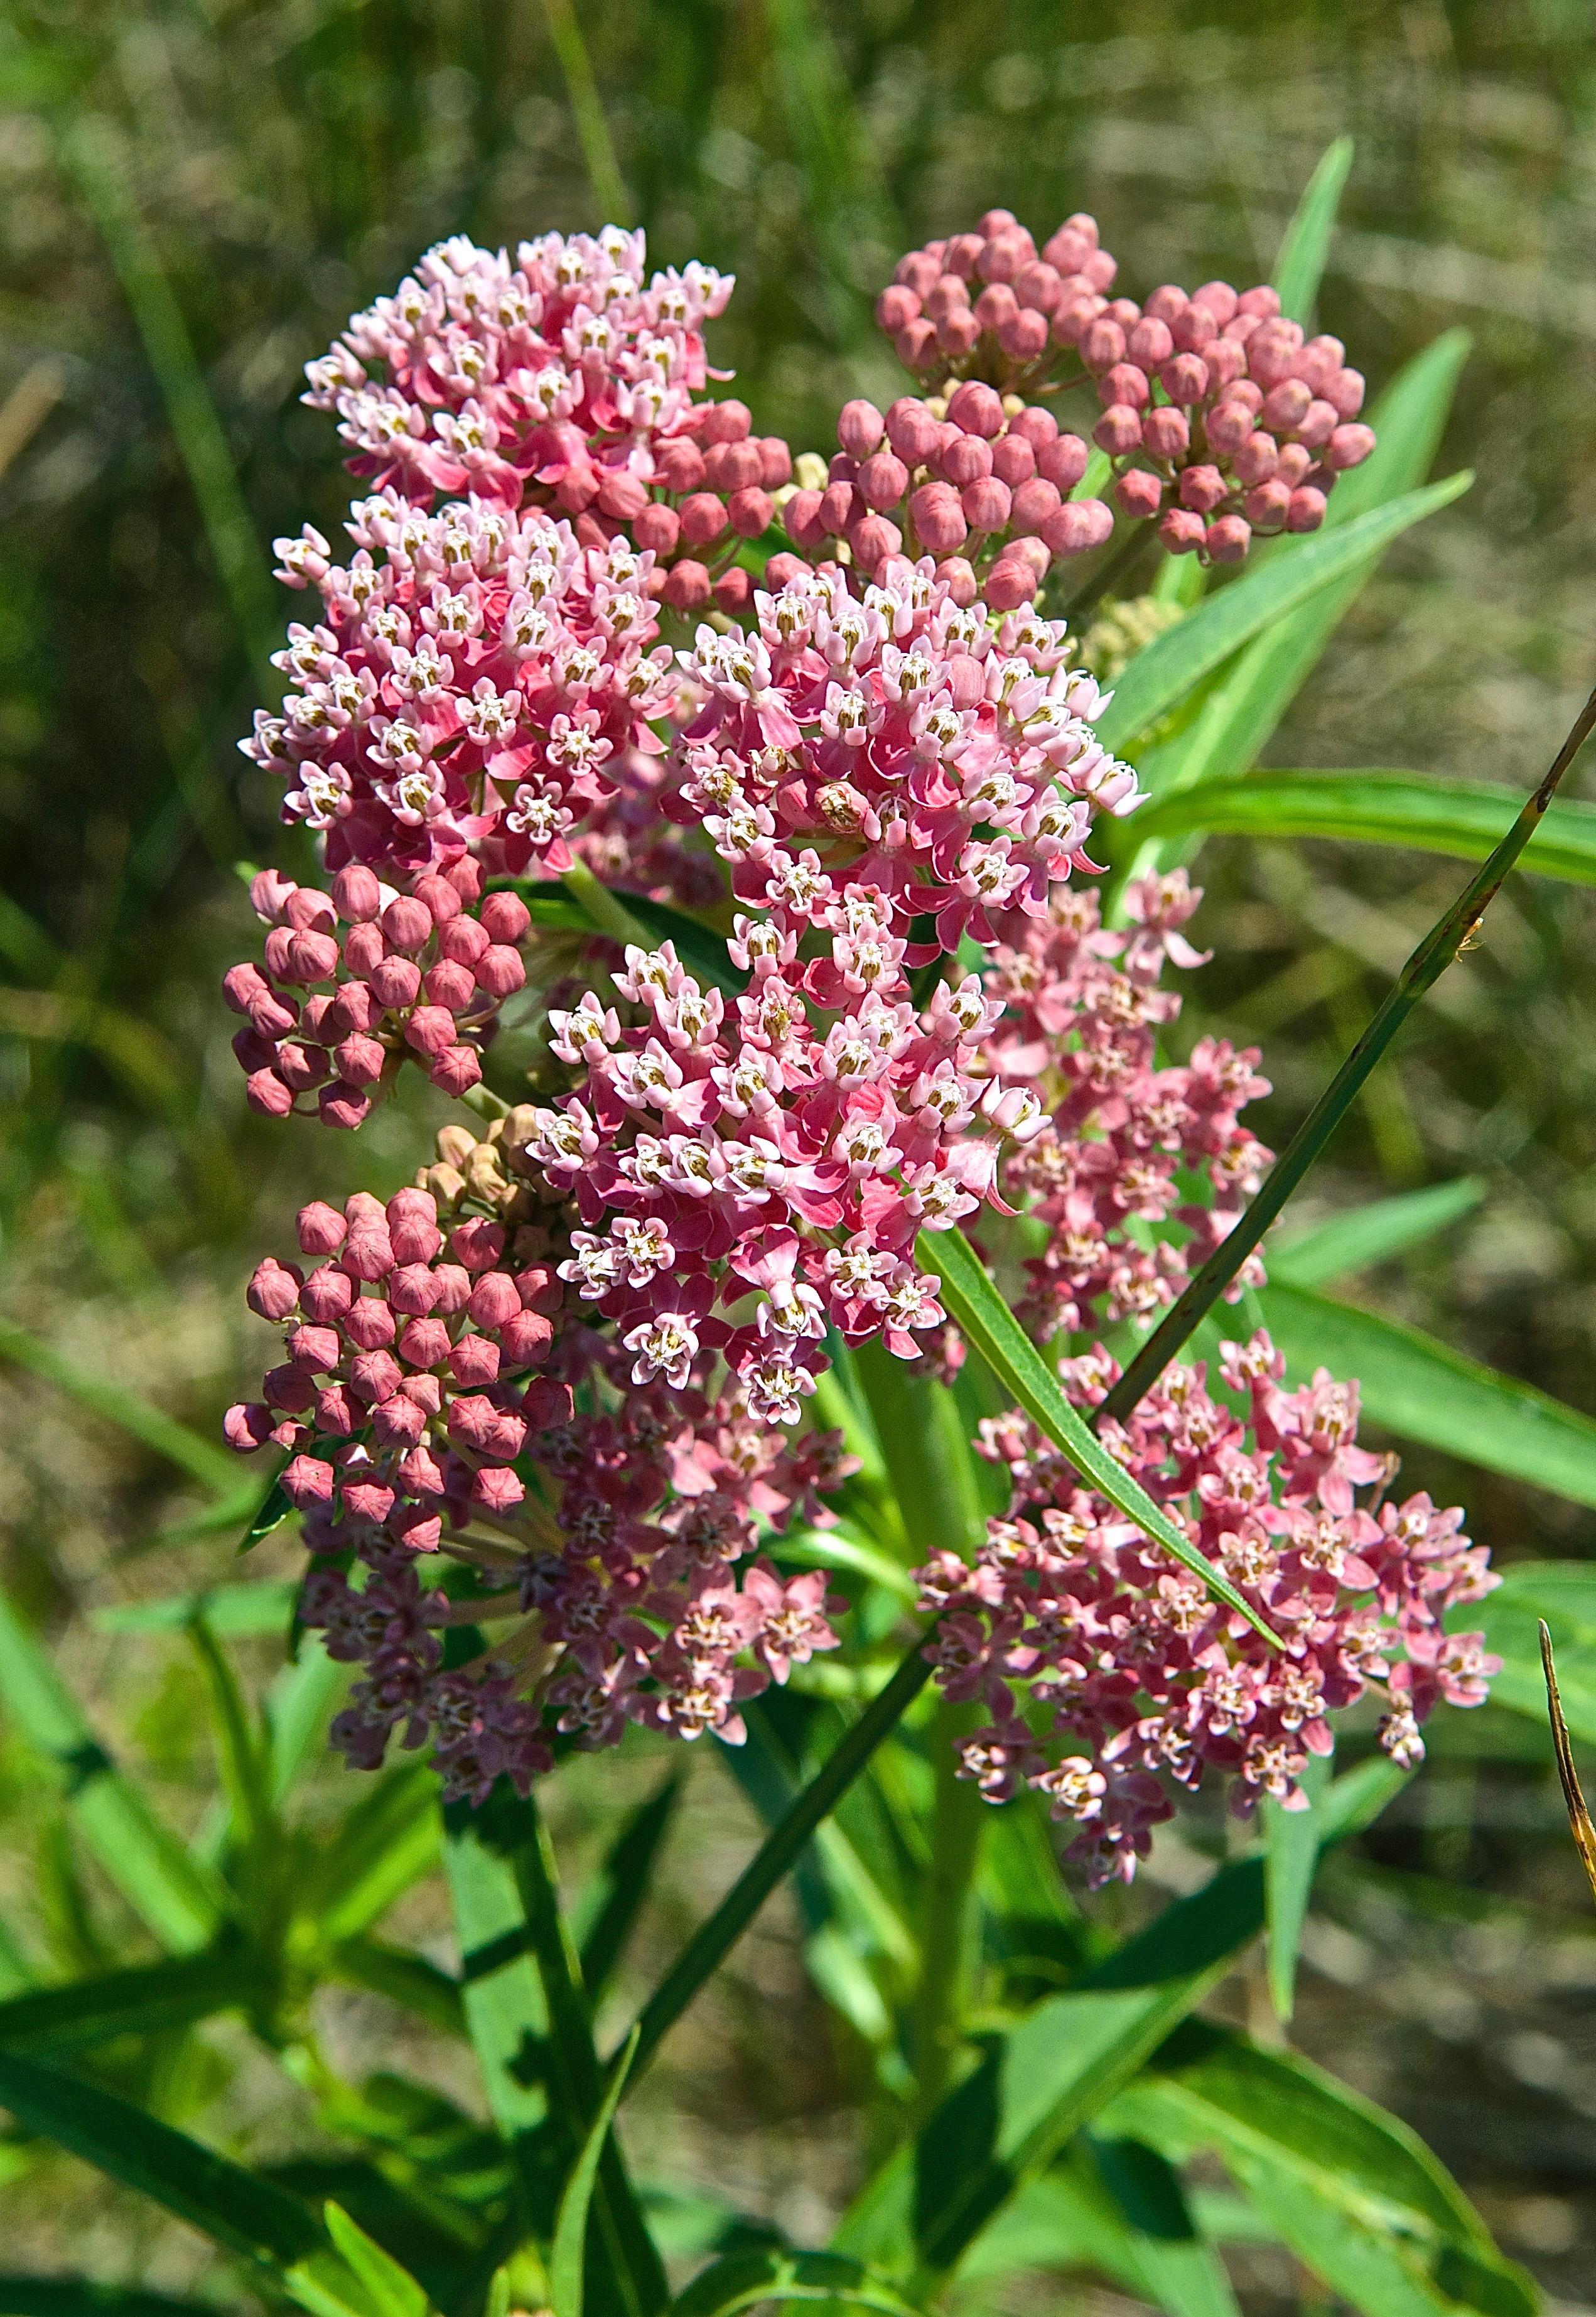 Swamp Milkweed (Asclepias incarnata)